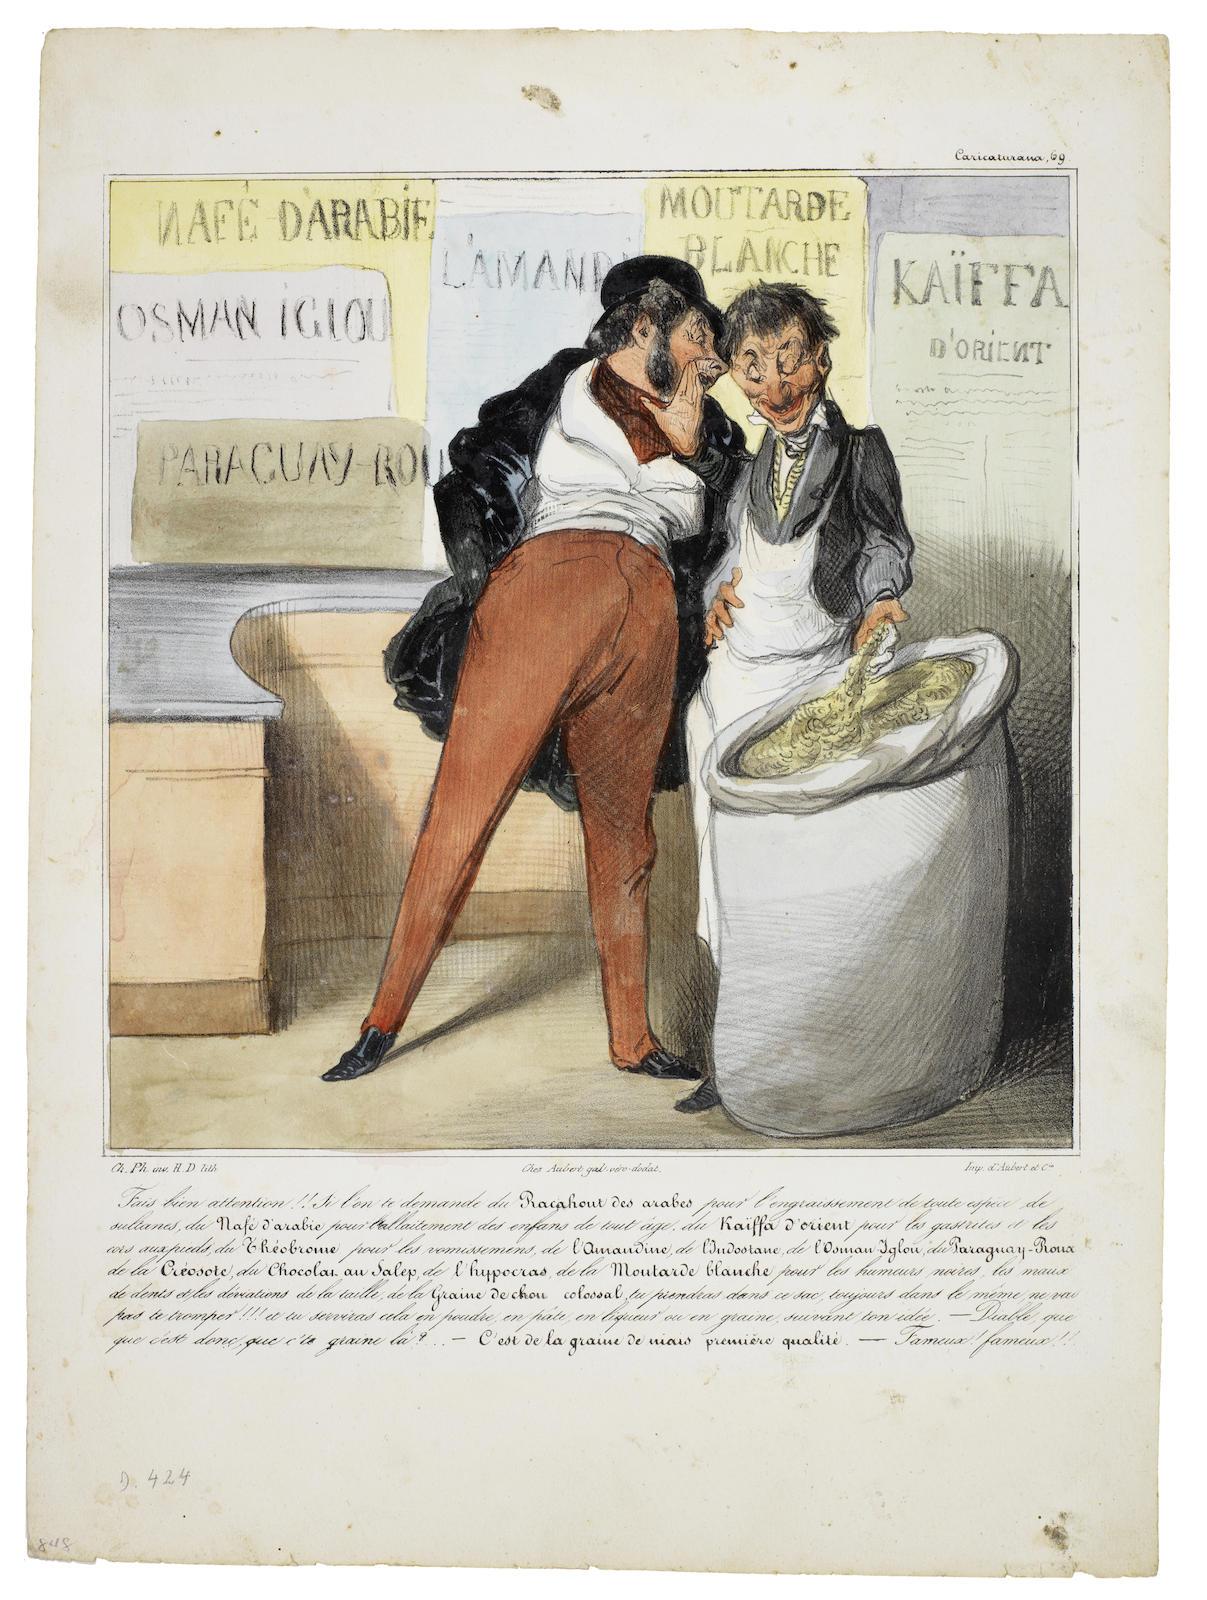 Honore Daumier-Caricaturana (Les Robert Macaire); Croquis d'Expressions (Delteil 366,368,382,383,397,424,441,450,474,495,498,503,510,515,516,519)-